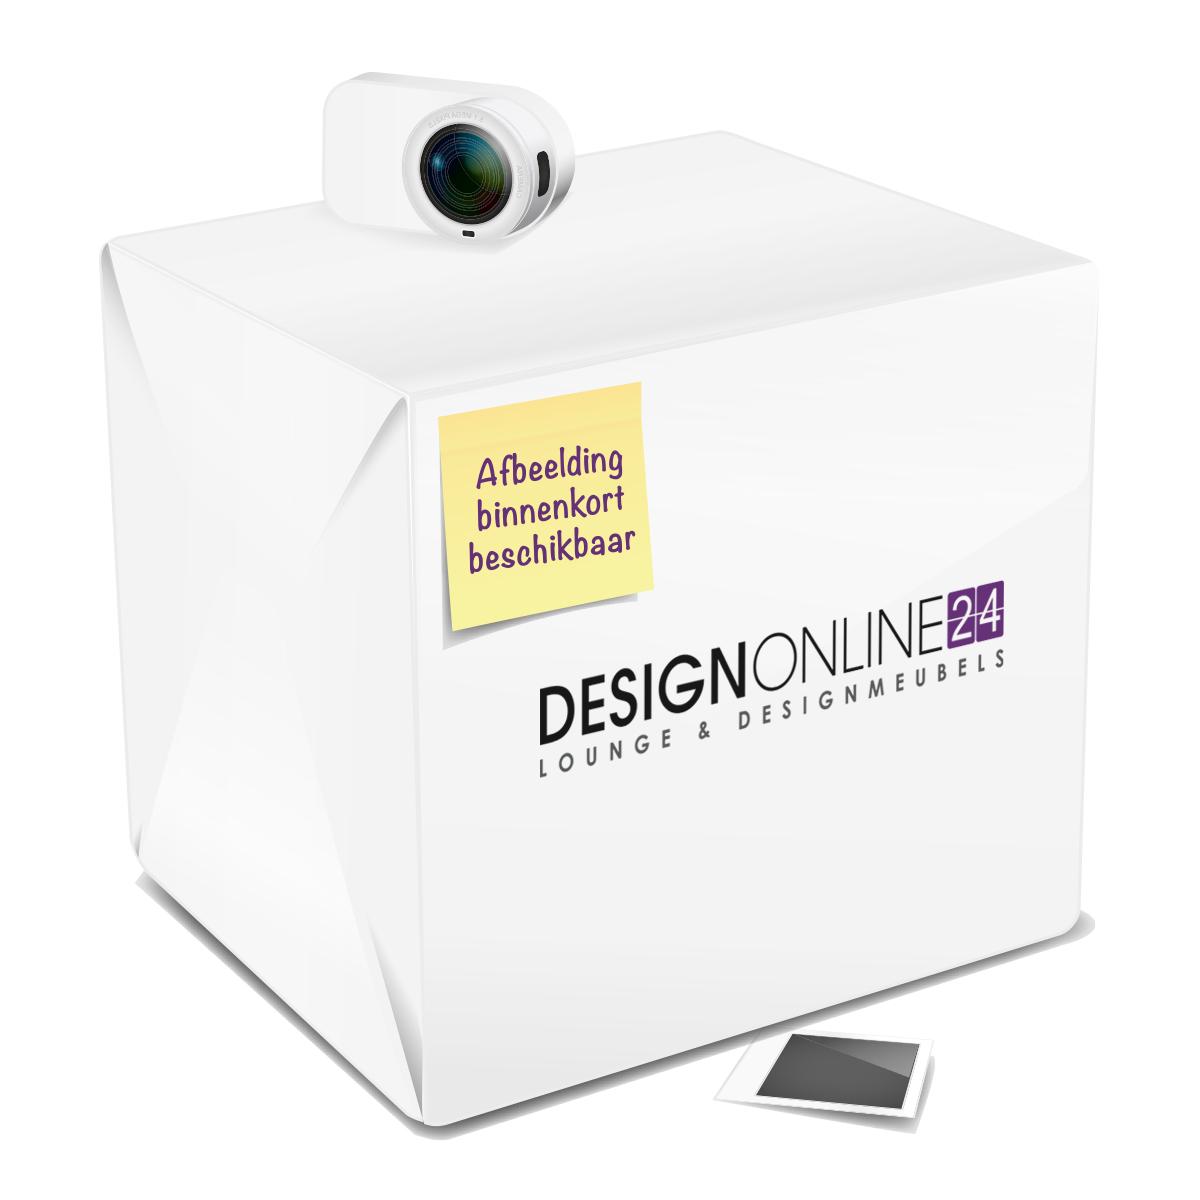 d-Bodhi Fendy Boekenrek - L120 x B40 x H180 - Teakhout + Gratis Design Tafellamp twv € 79,95